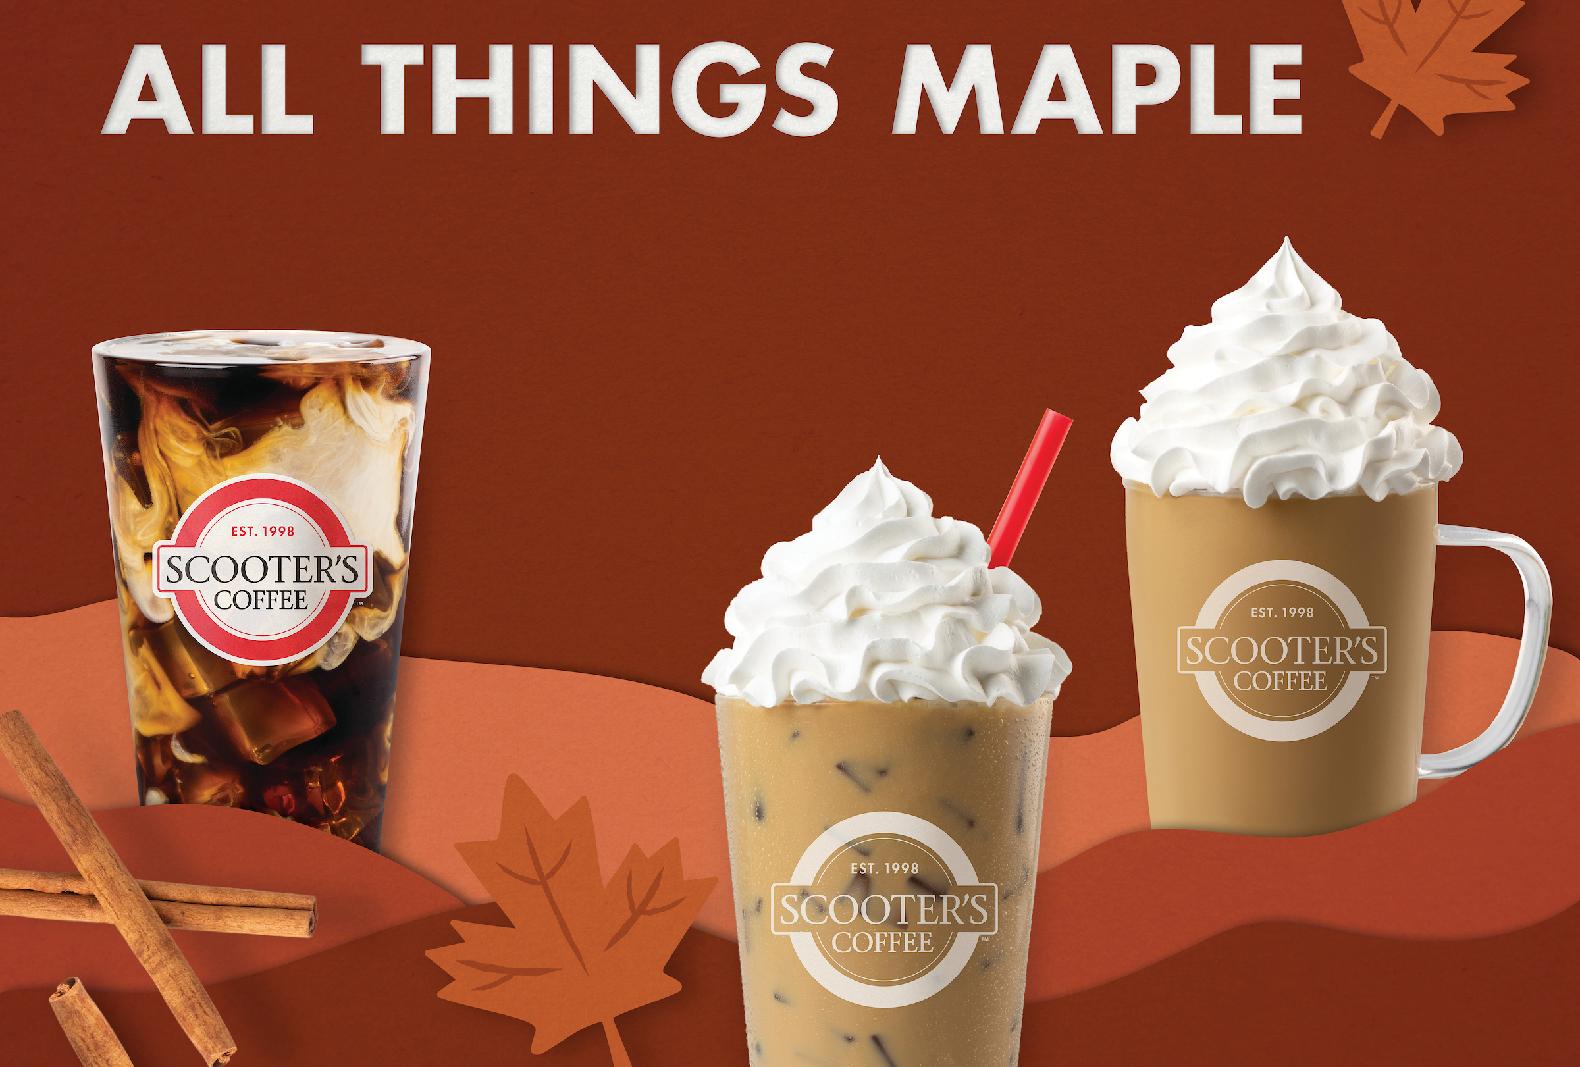 Scooter_s_Coffee_Maple_Drinks.jpg